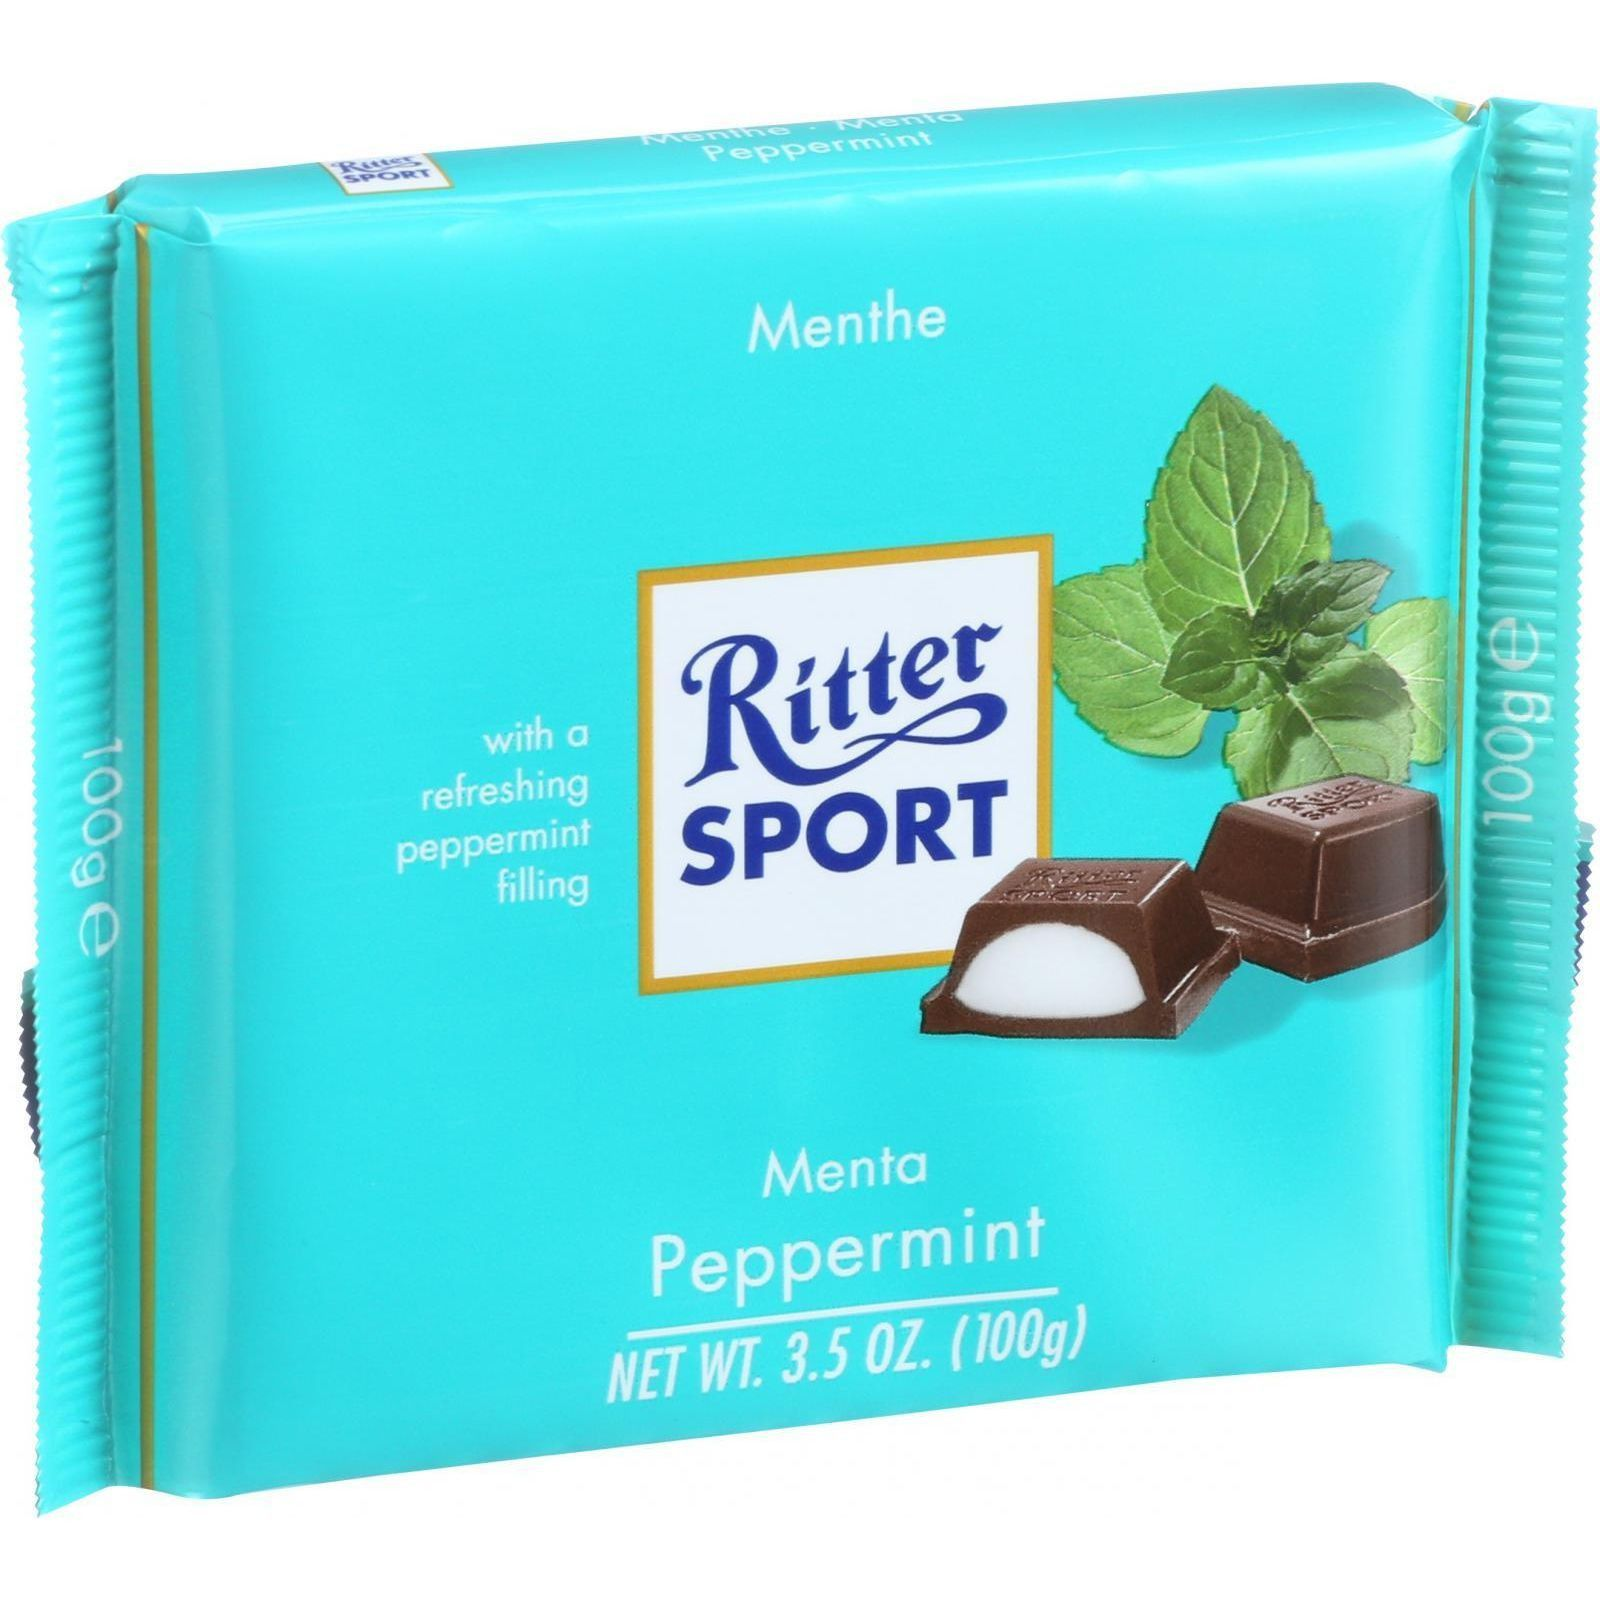 Ritter Sport Xmas Box Chocolate cube, Packaging design